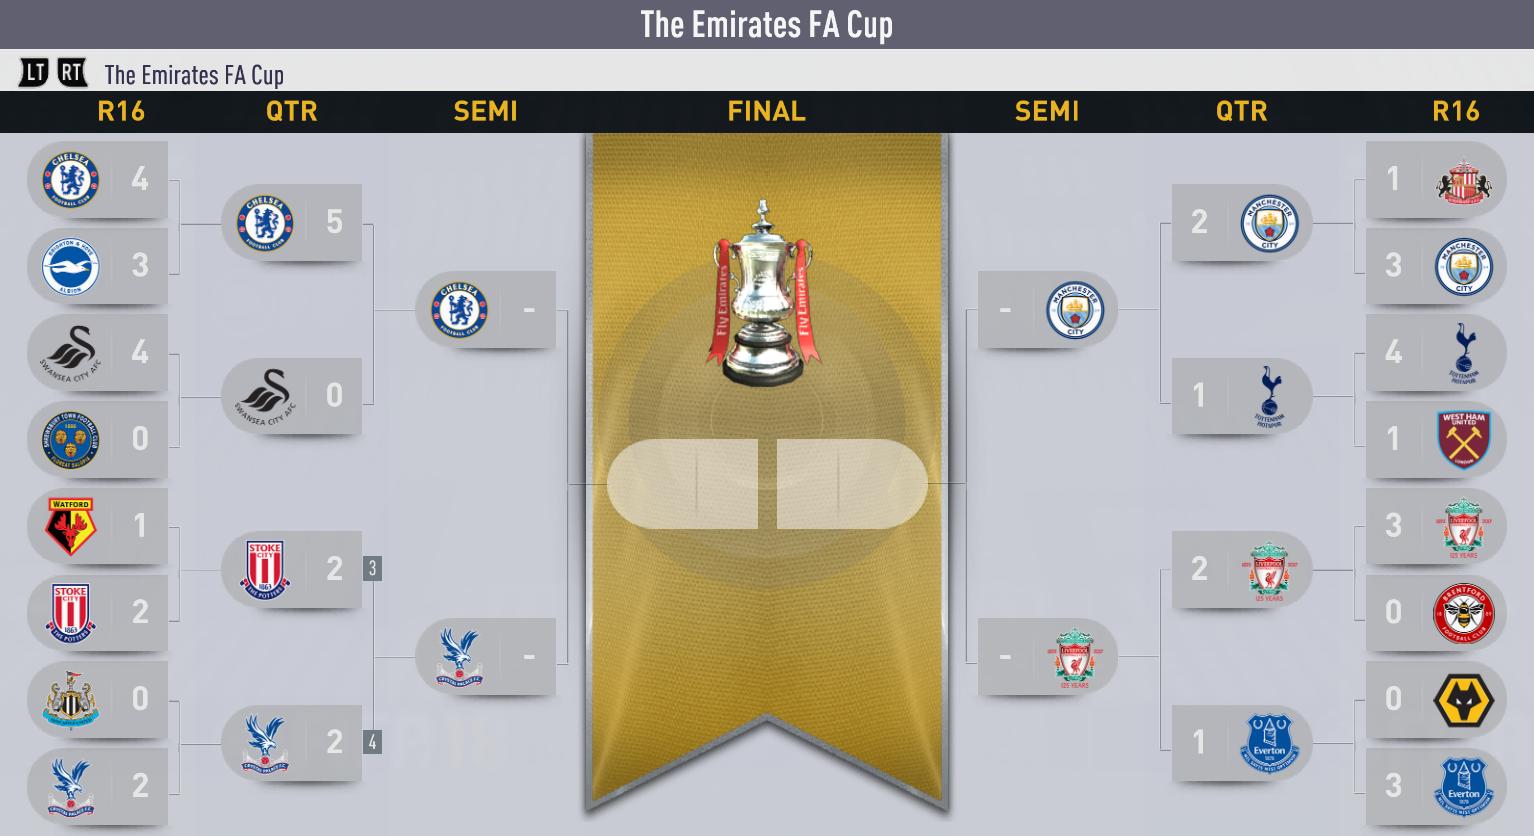 18-19 3月終了時点 FA順位